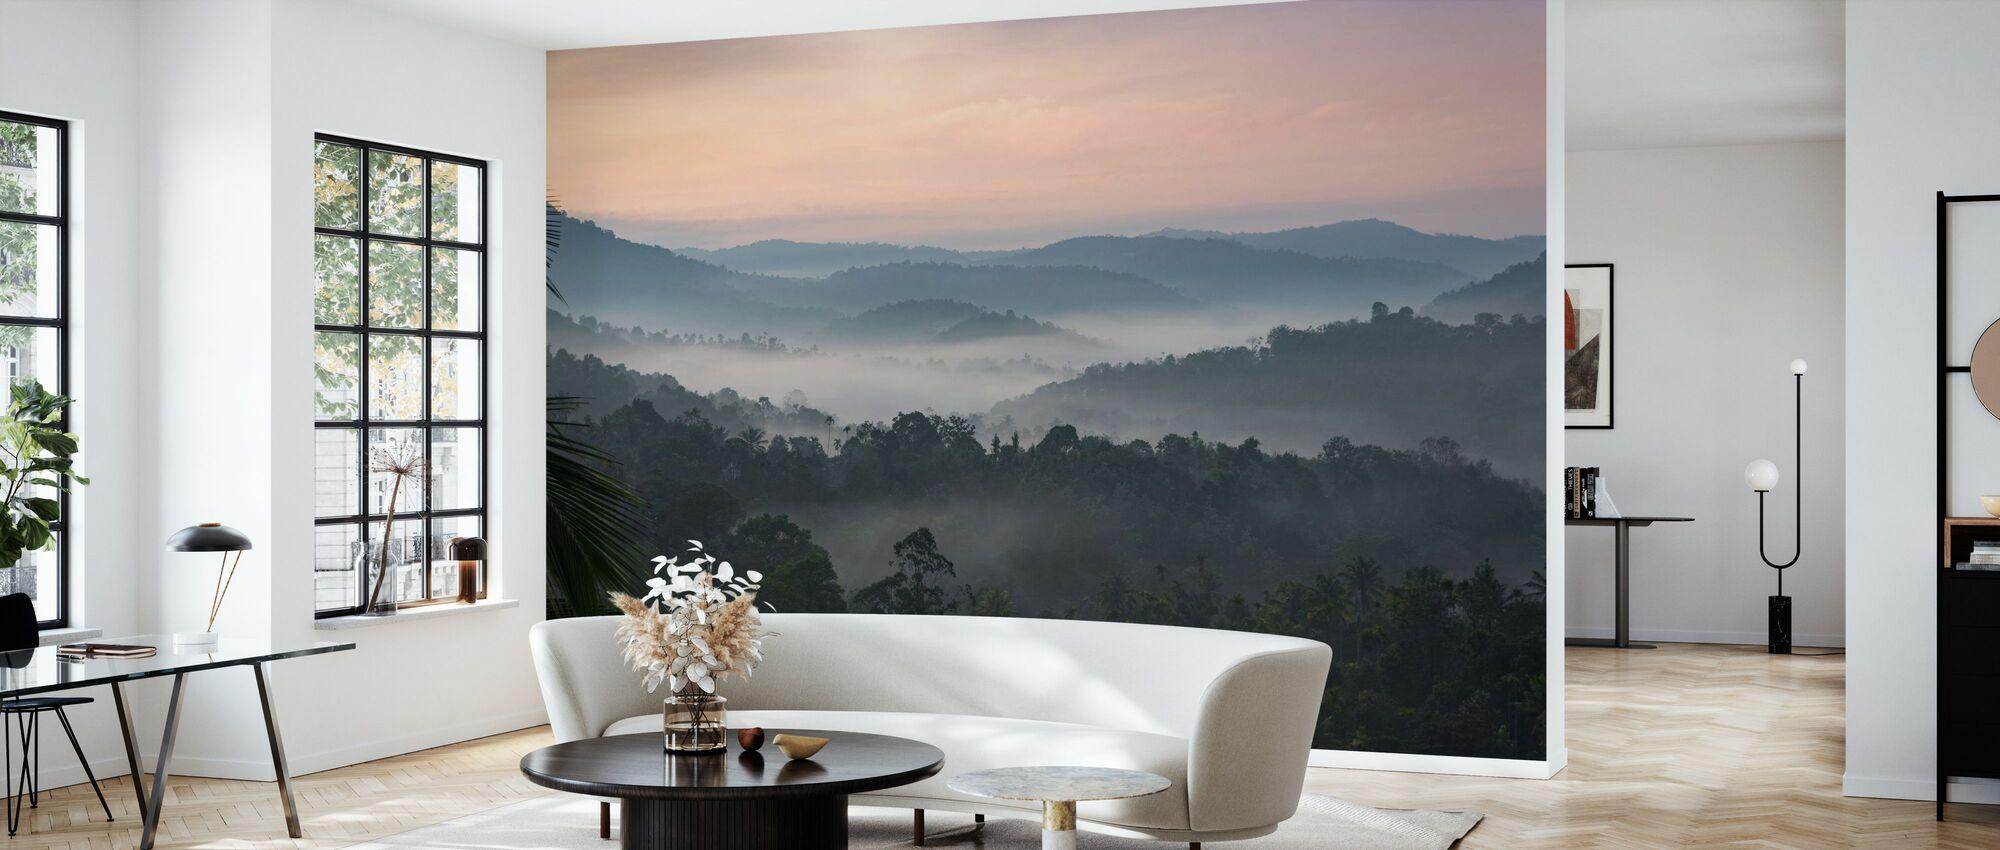 Misty Hills at Sunrise - Wallpaper - Living Room